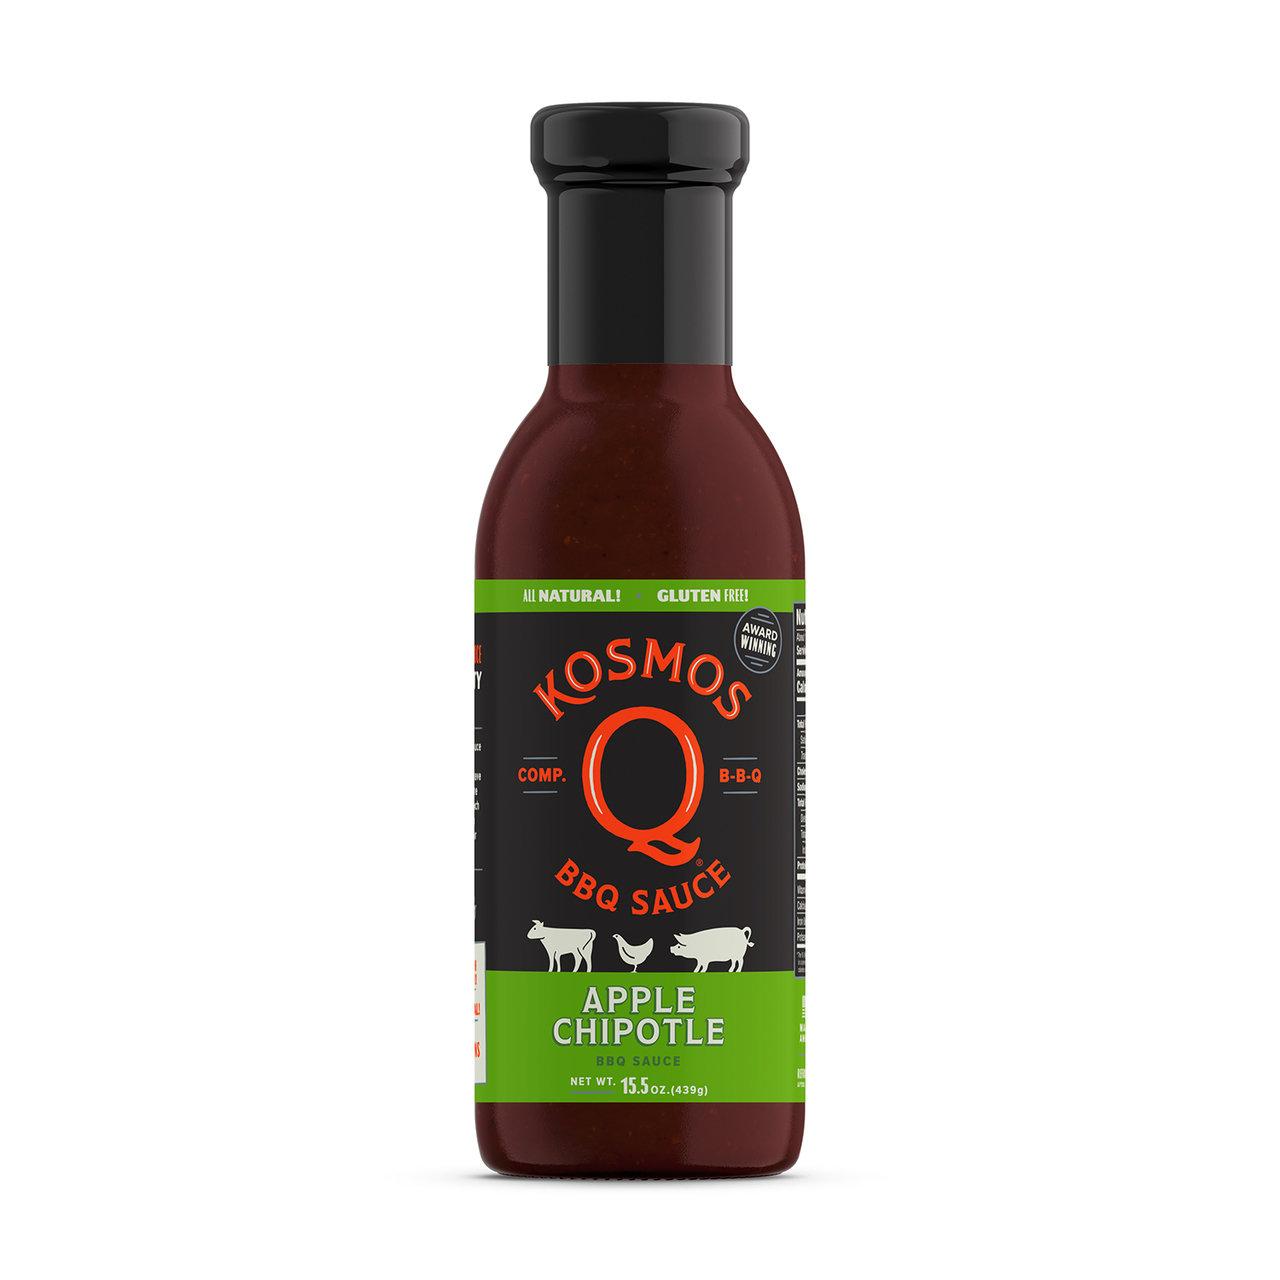 Kosmos Sweet Apple Chipotle BBQ Sauce 0851818003284